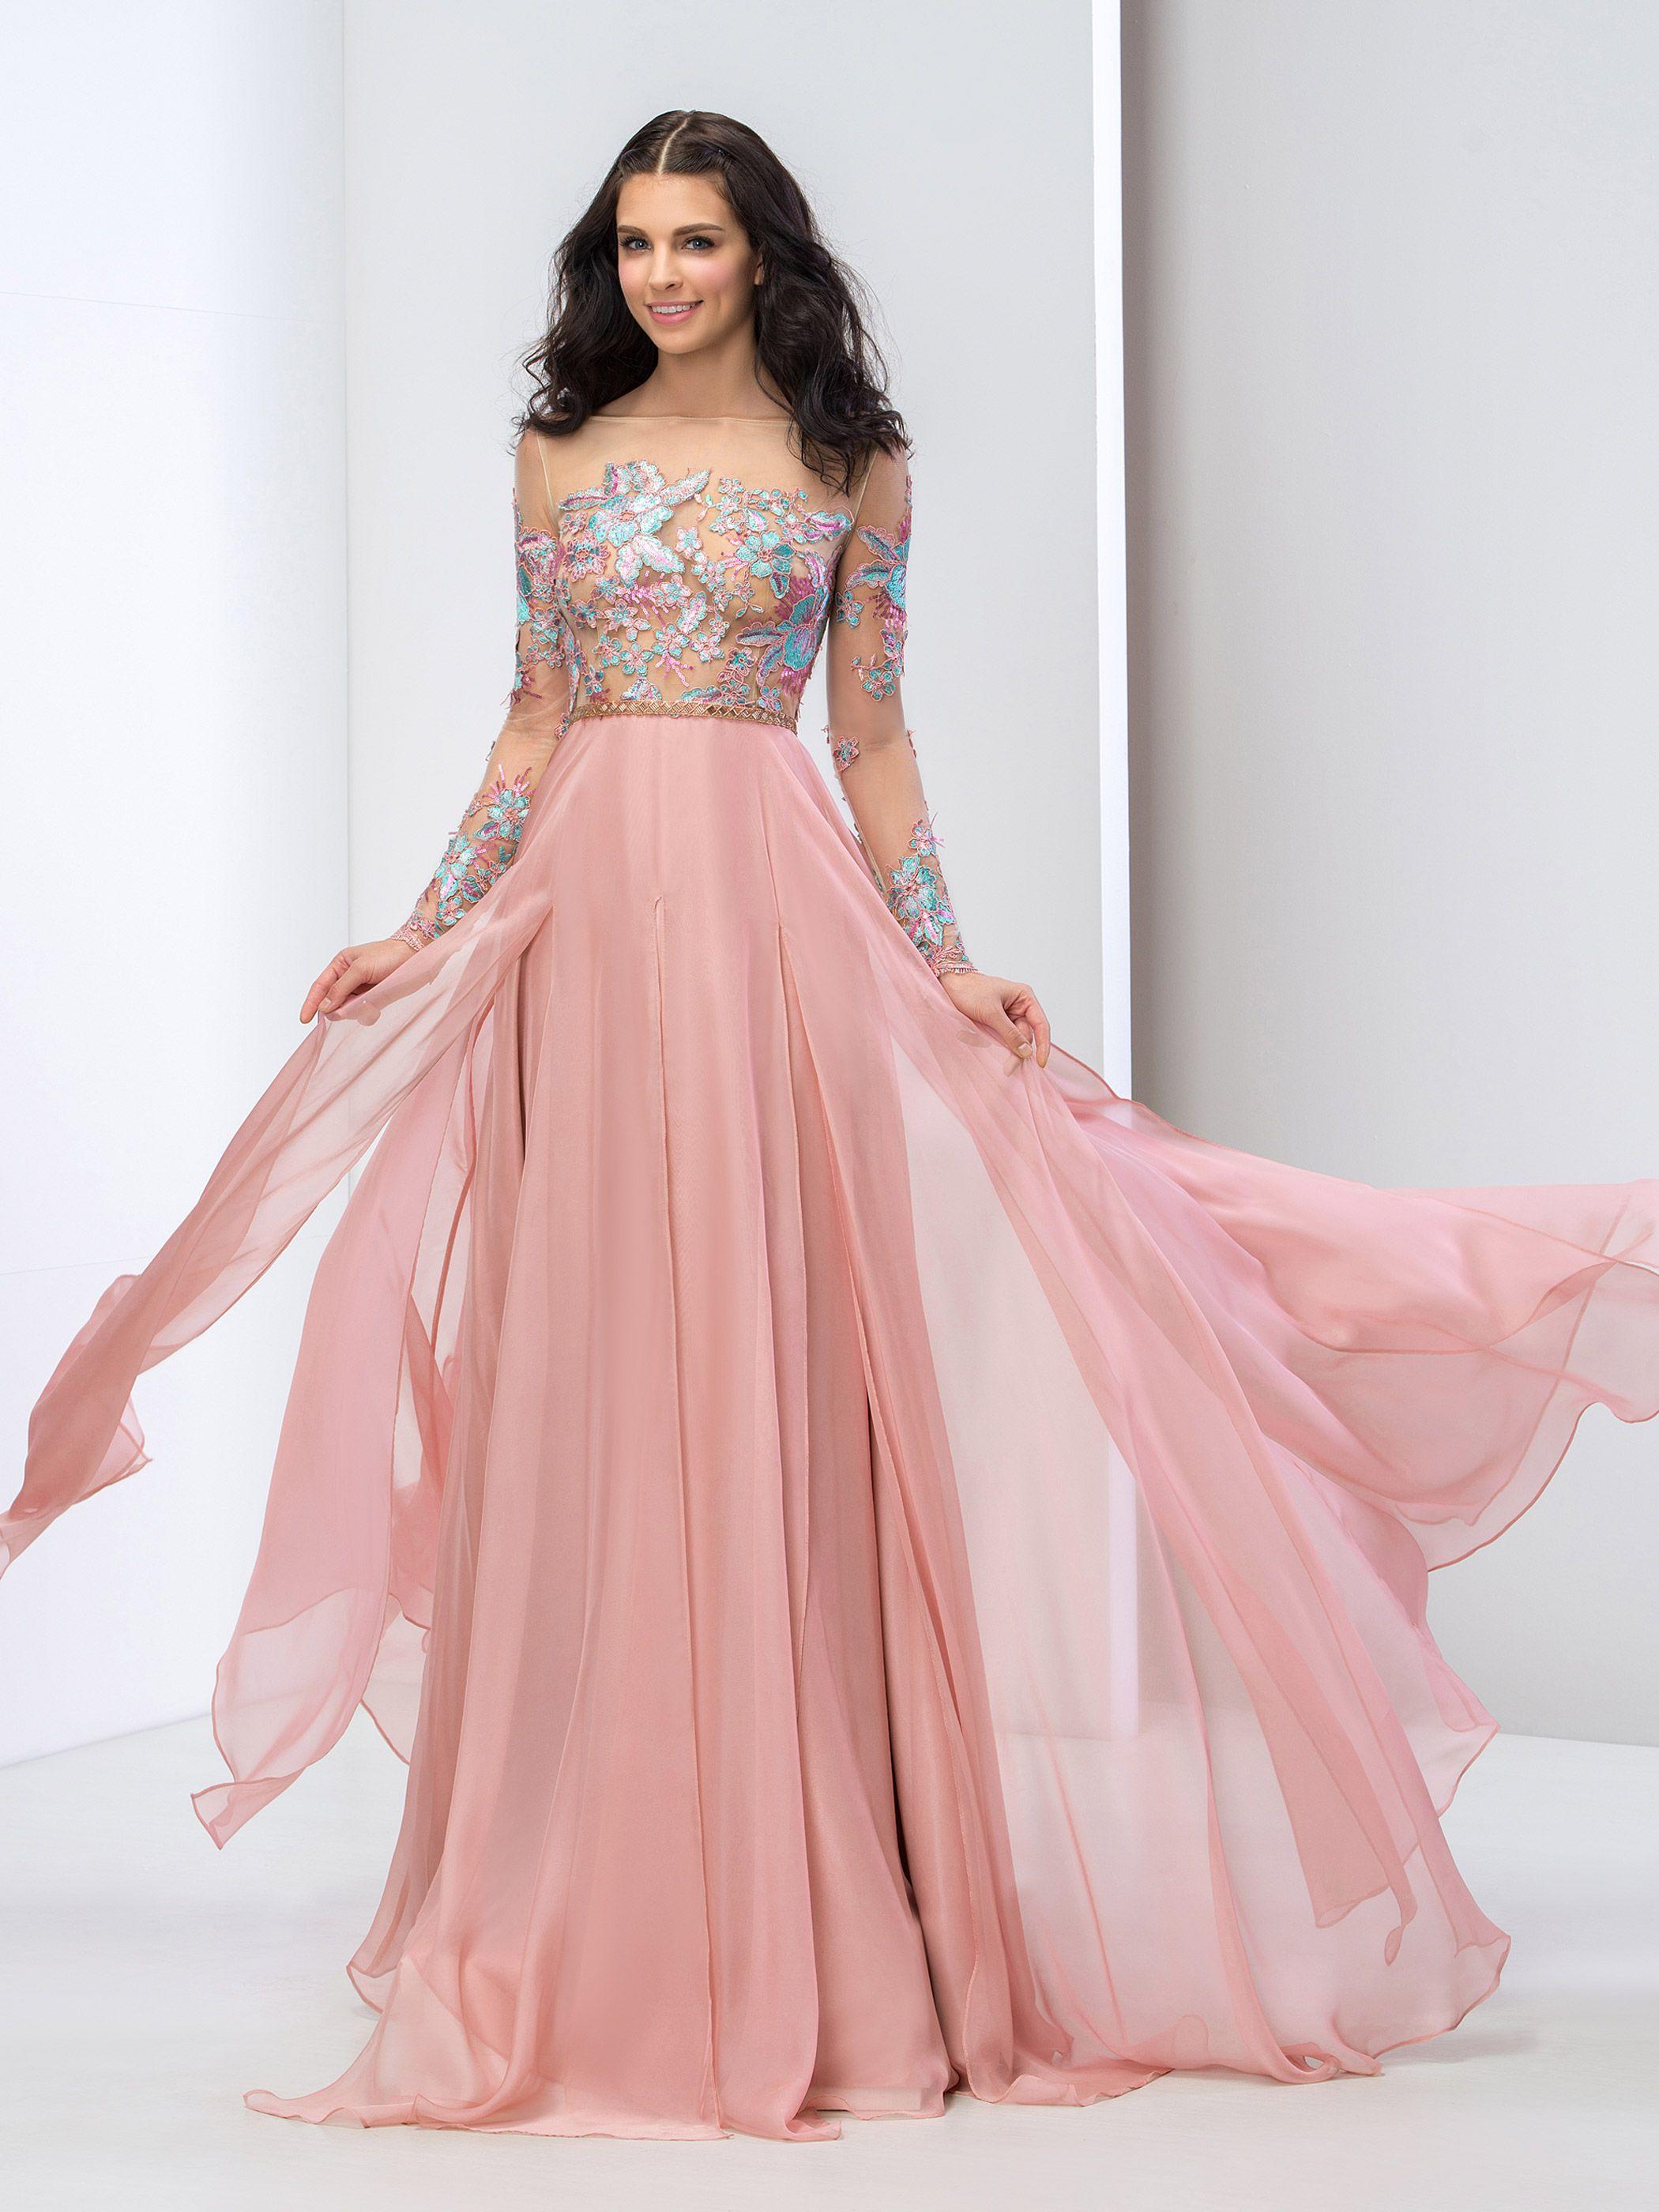 Long Sleeve Off-the-Shoulder Flower Floor-Length Prom Dress